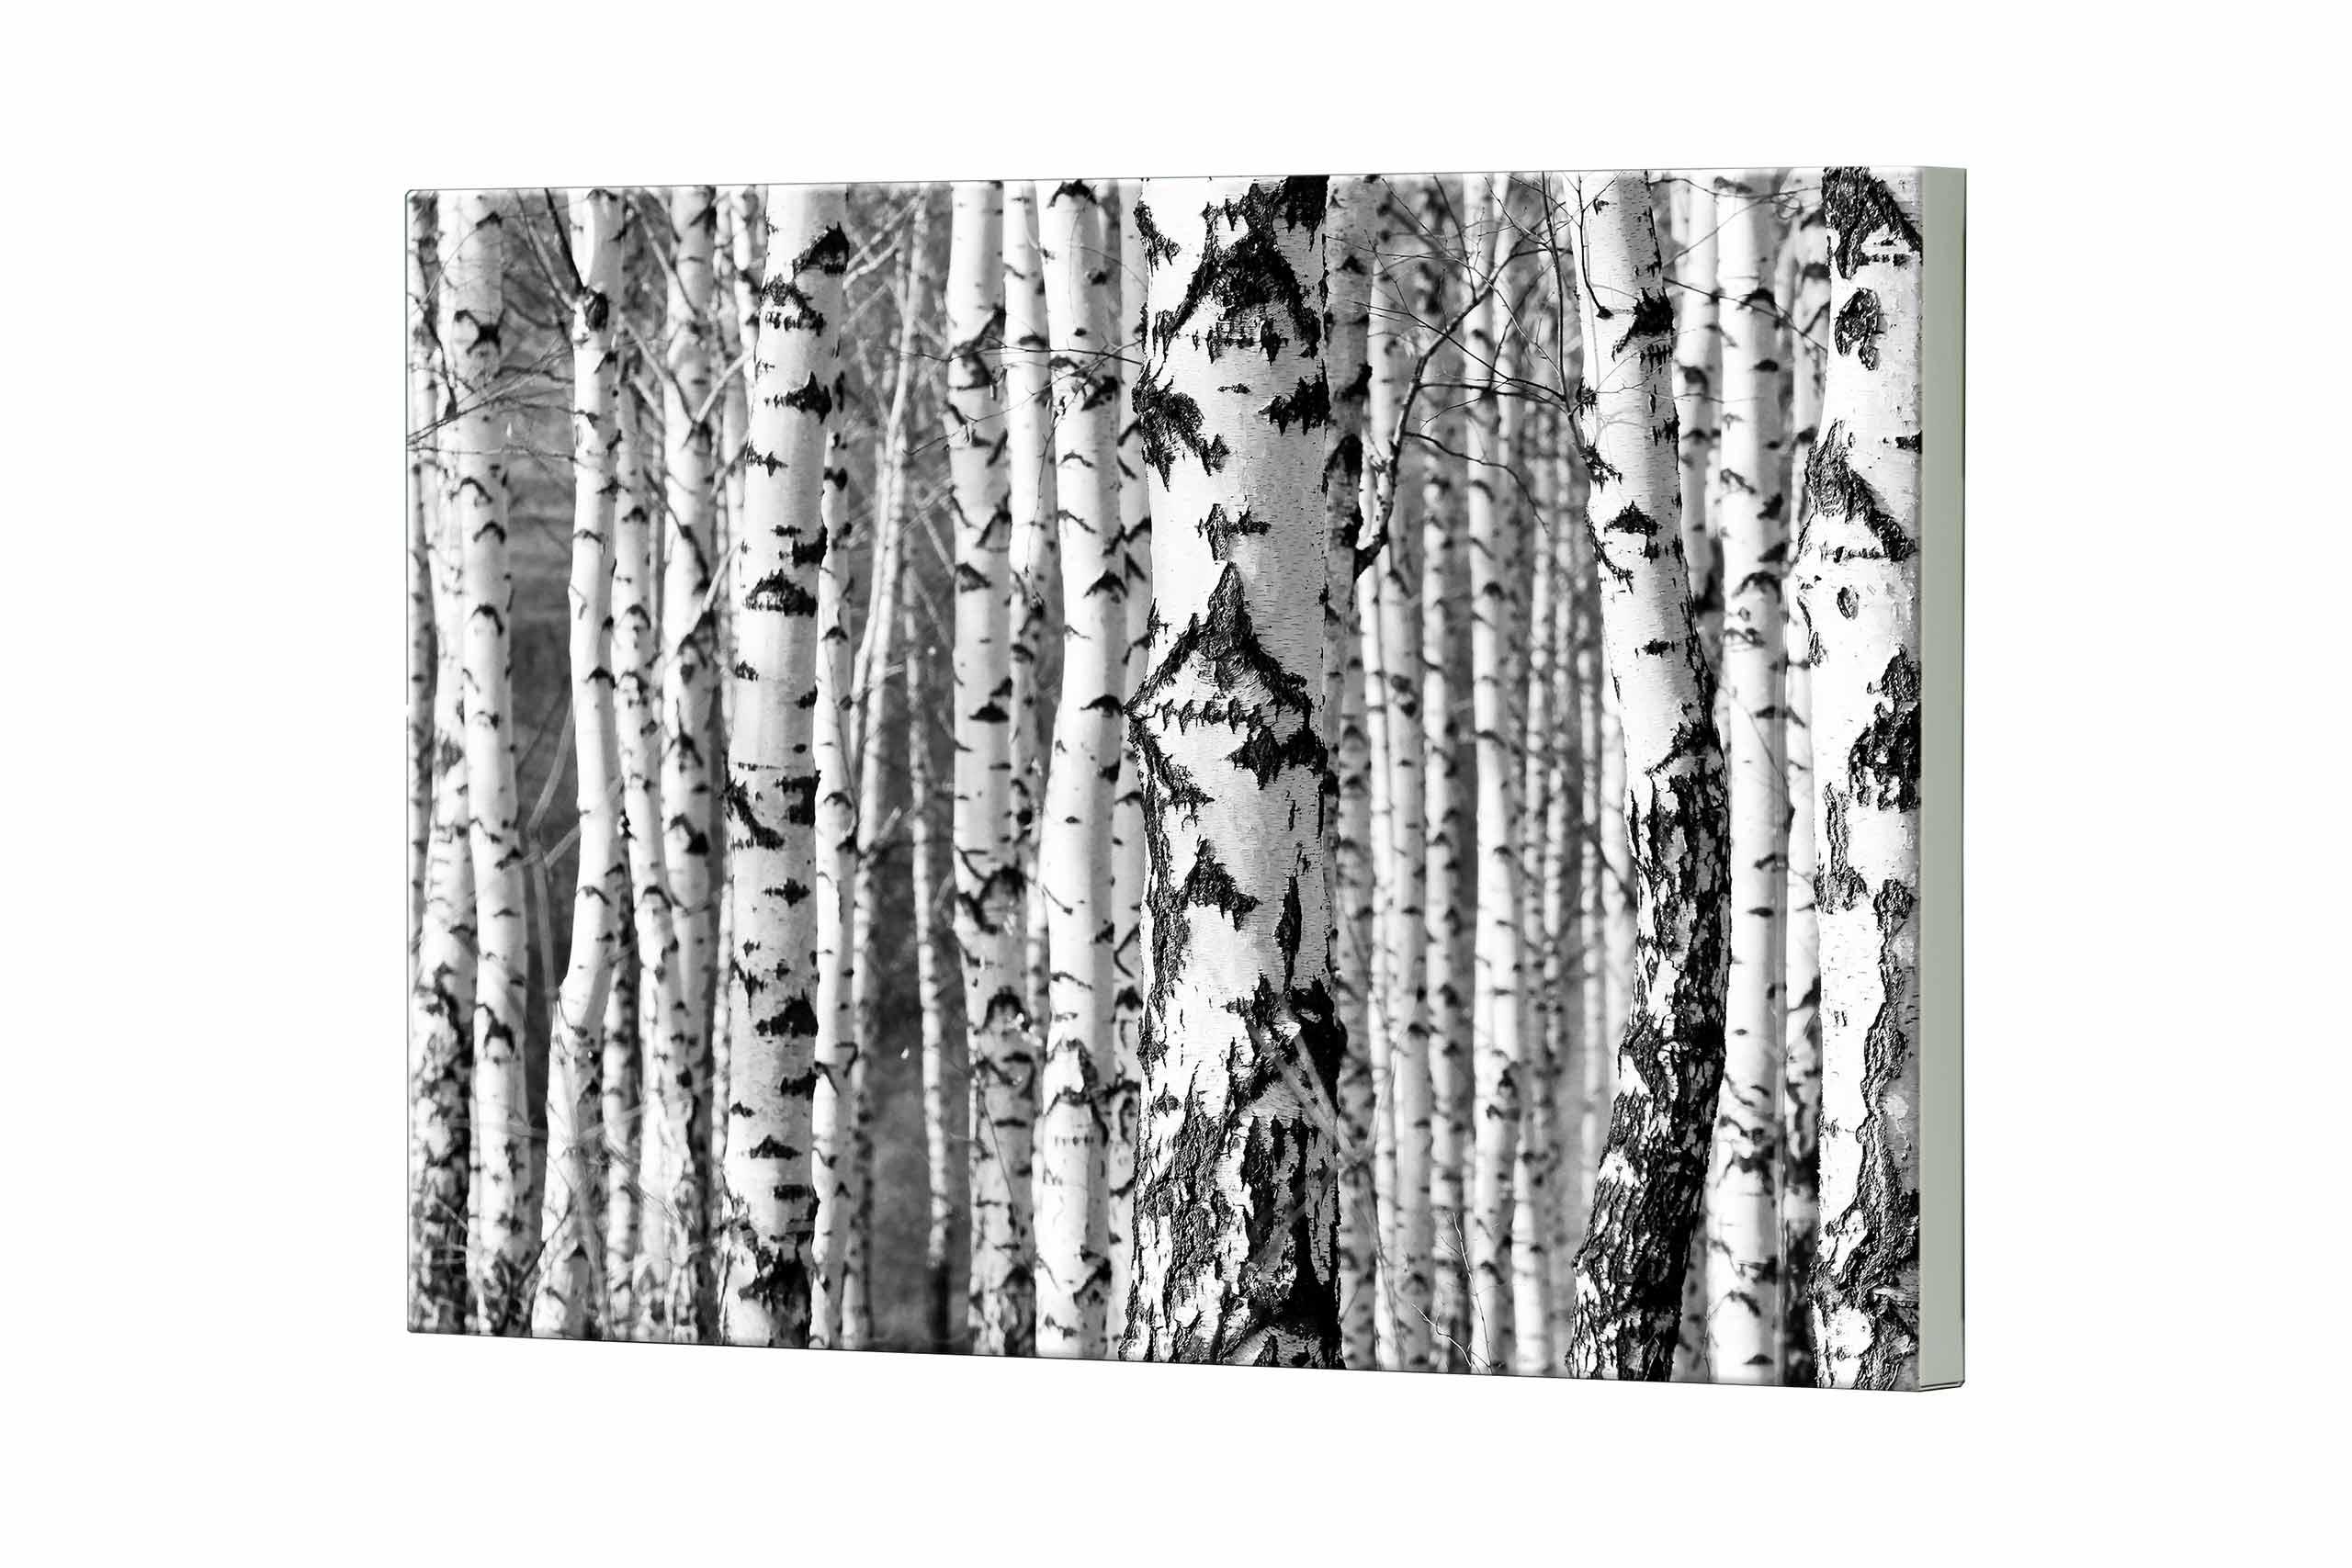 Magnettafel NOTIZ 80x60cm Motiv Birkenwald MDQ300 Motiv-Pinnwand